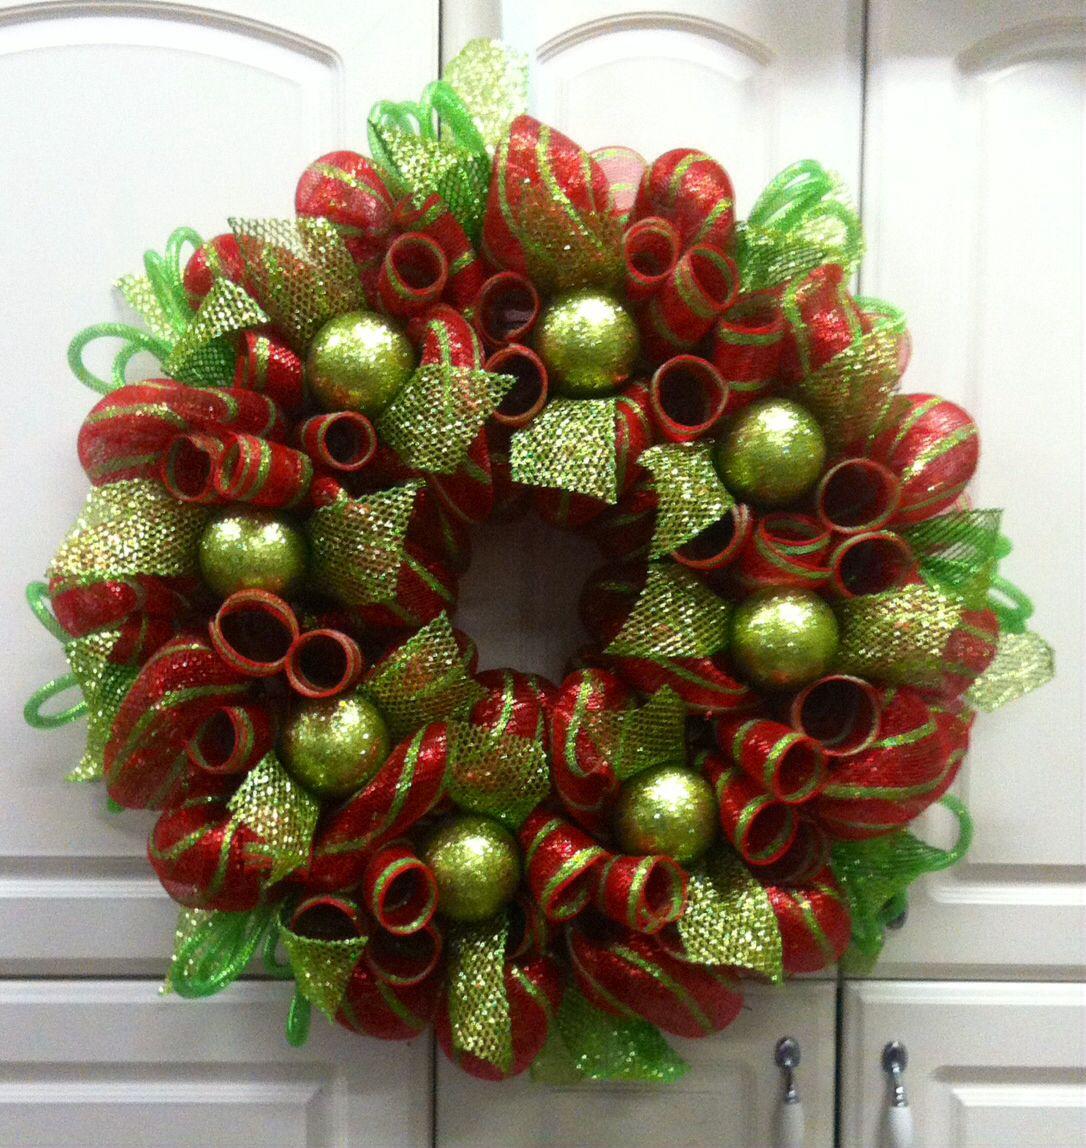 Deco Mesh Christmas Tree Wreath: Christmas Deco Mesh Wreath, Www.countrychicscreations.com